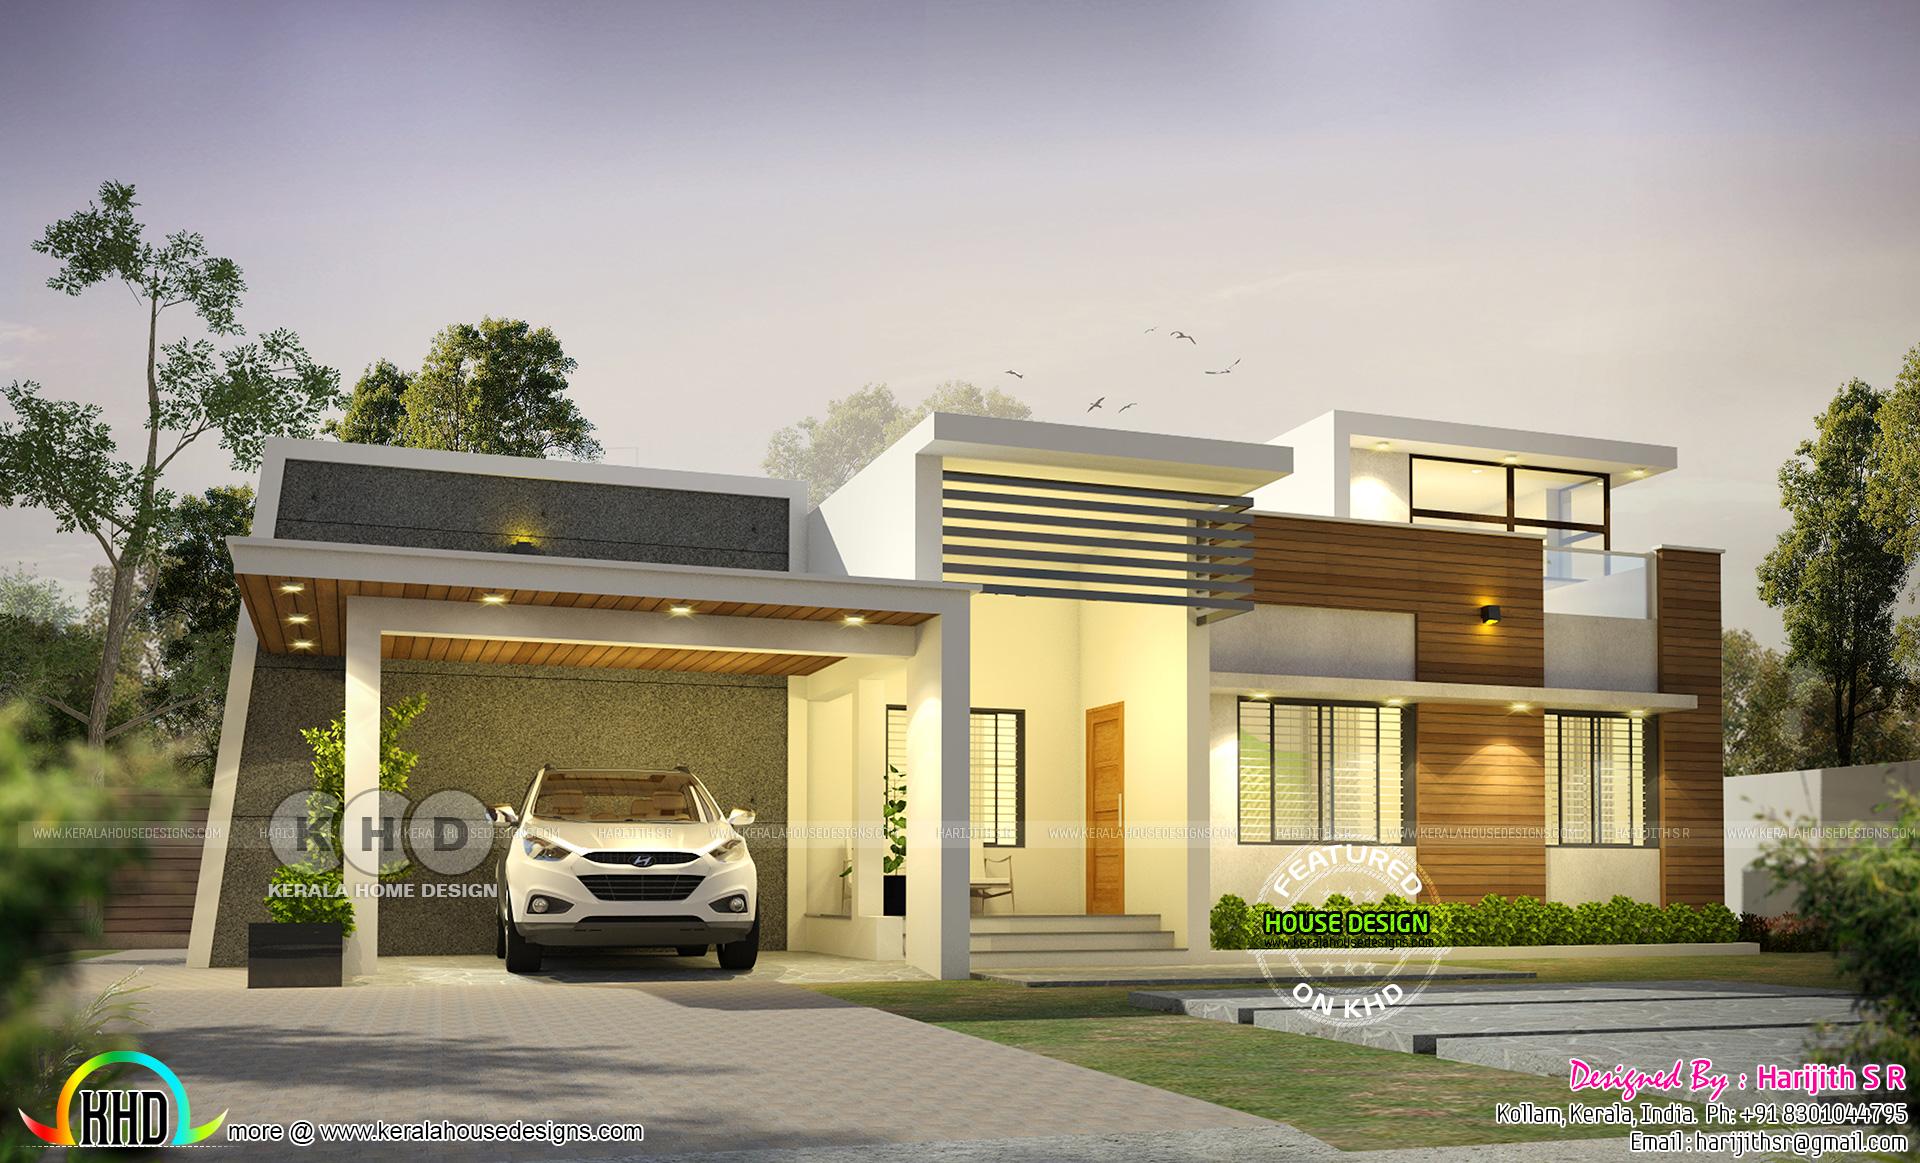 1600 sq-ft modern single floor Kerala home - Kerala home ...